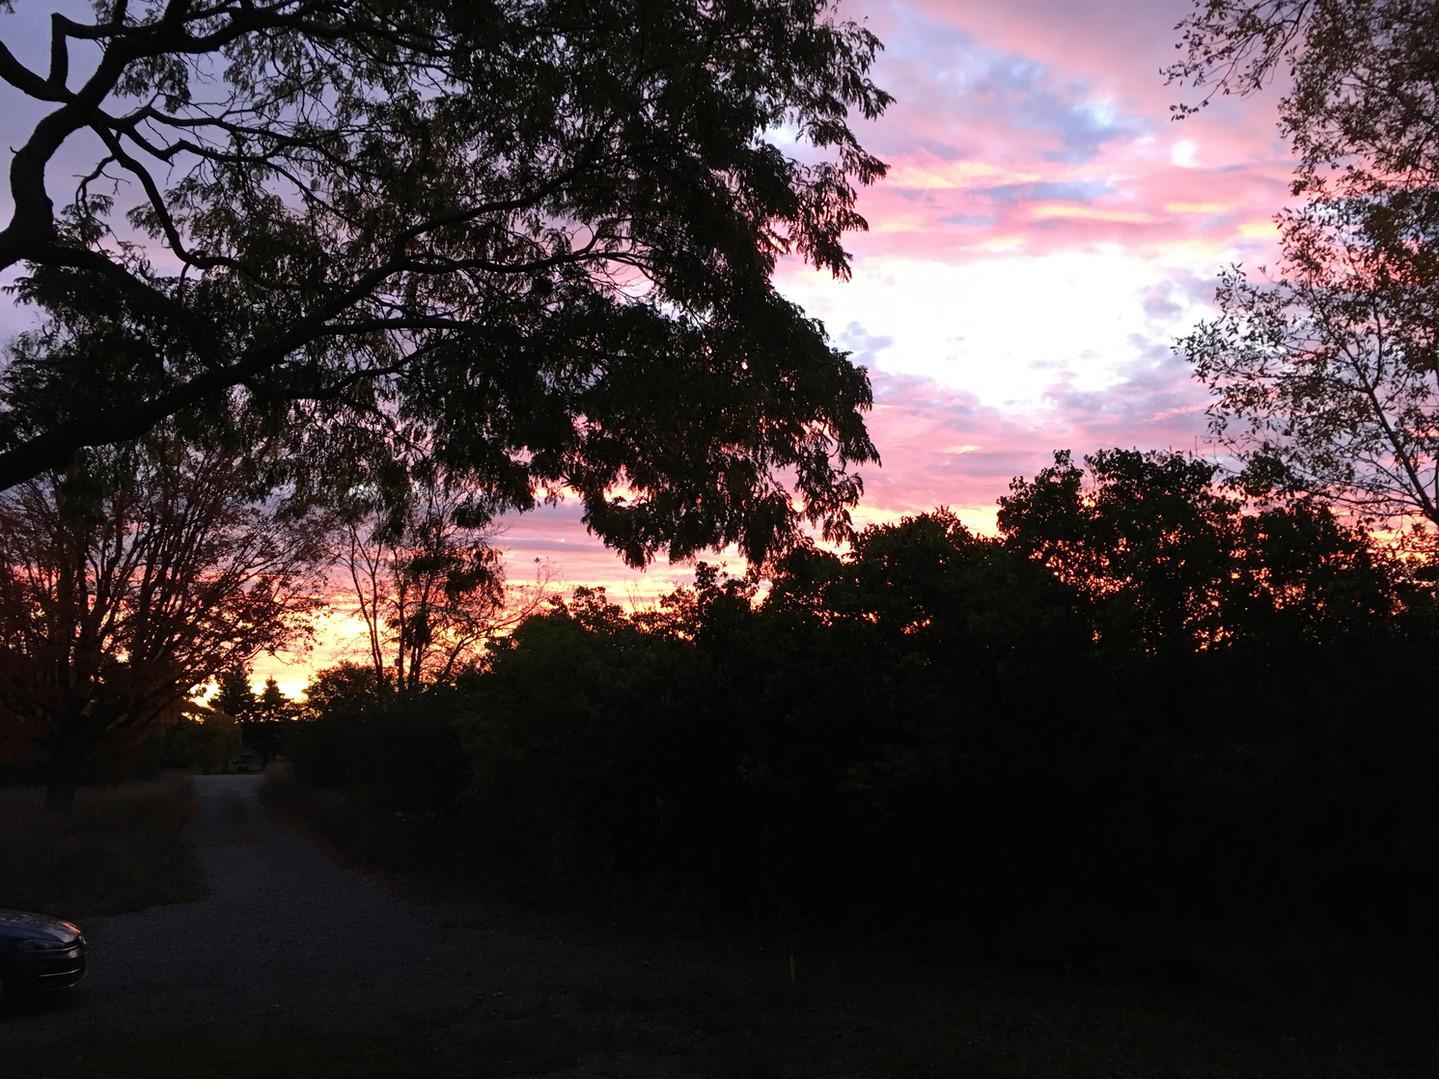 Sunrise Summer 2019-1.JPG